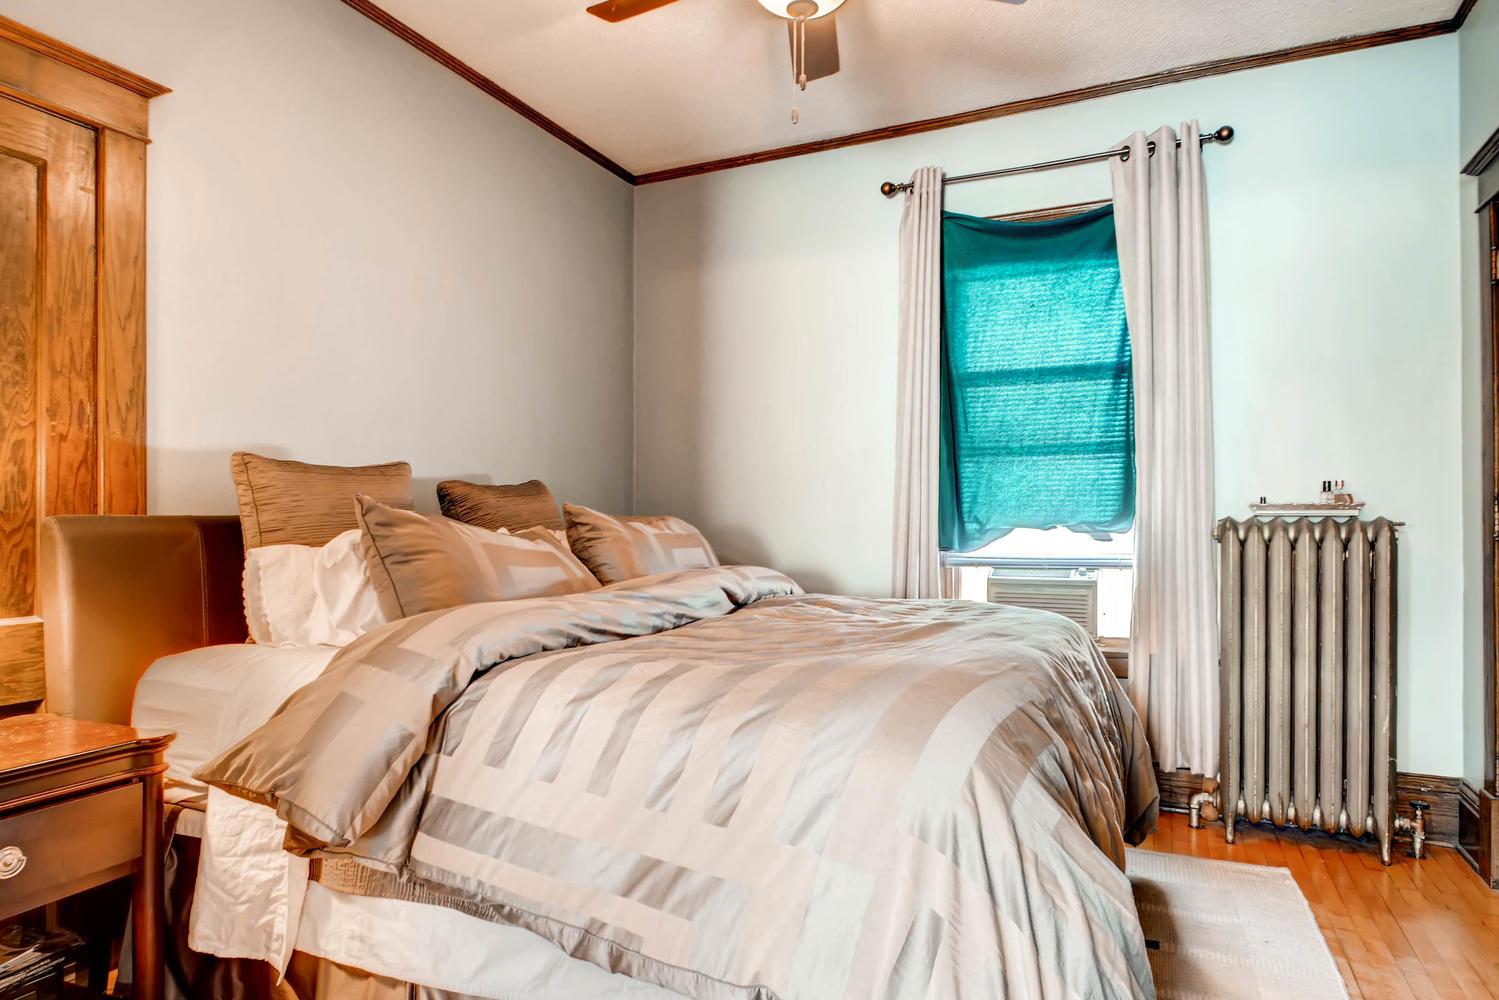 1121 Washington St NE-large-013-12-2nd Floor Bedroom-1500x1000-72dpi.jpg